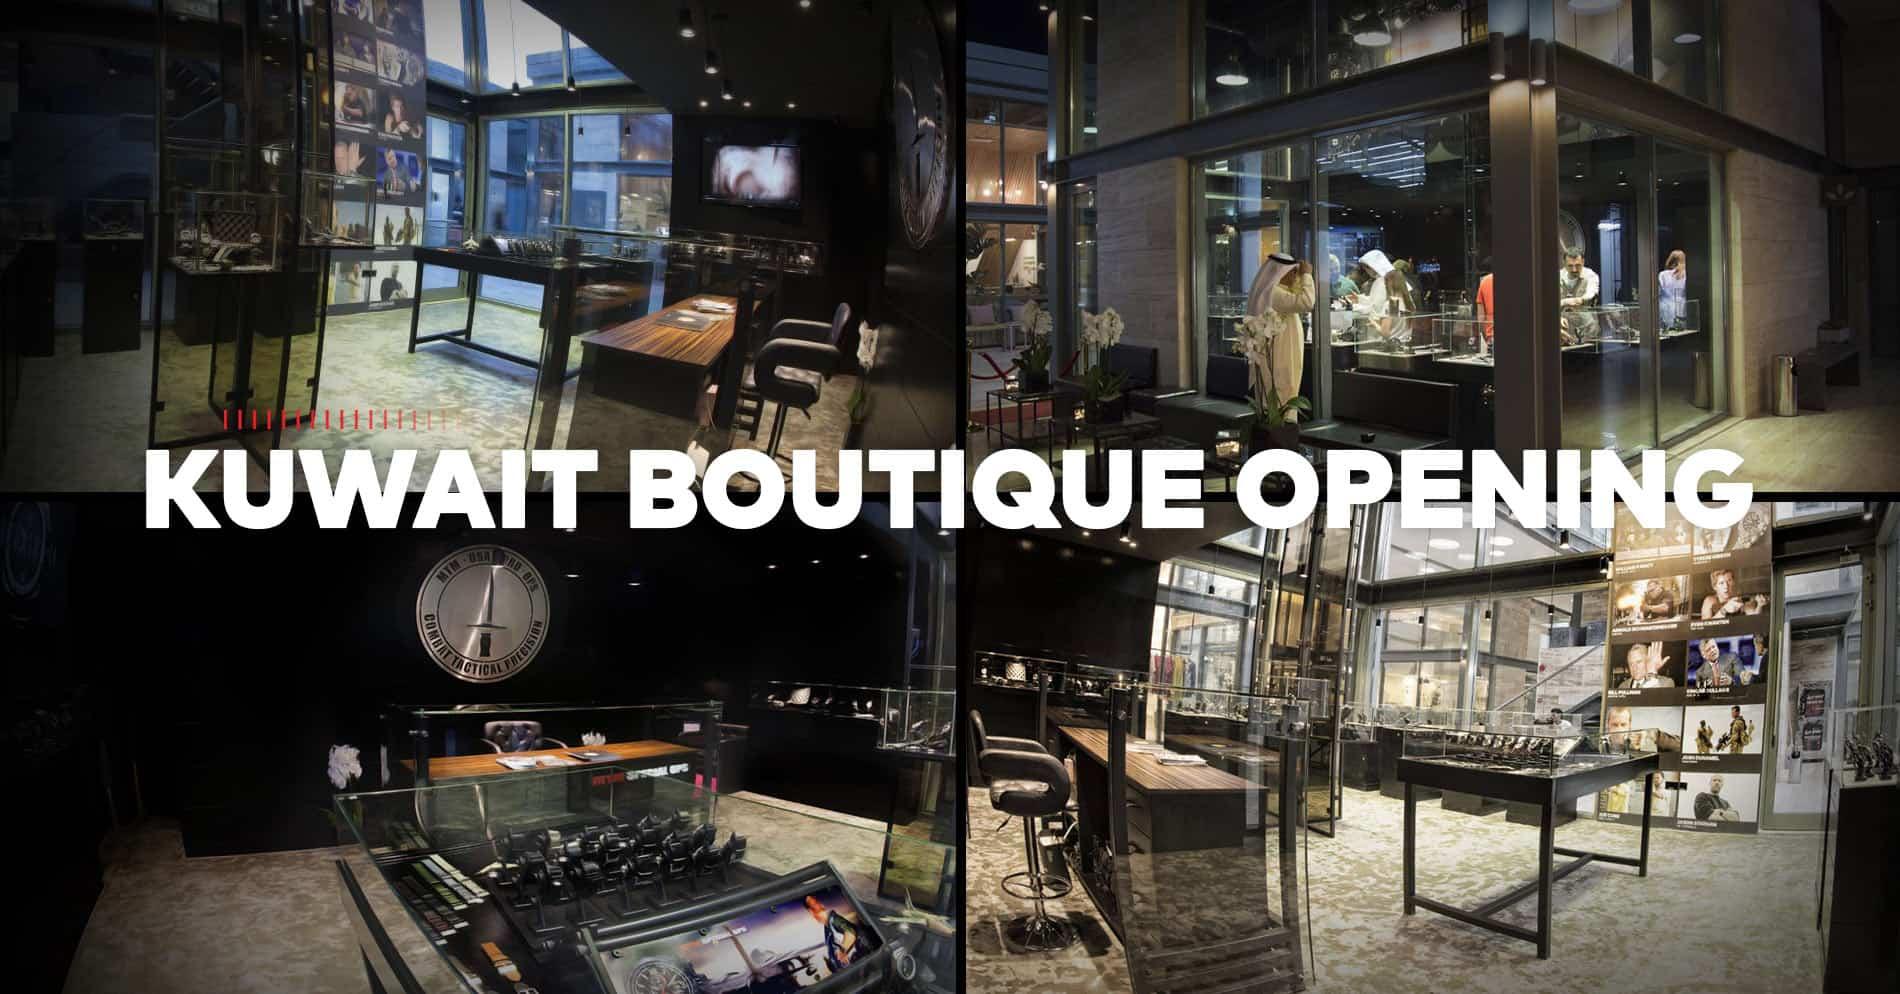 MTM Special Ops Kuwait Boutique